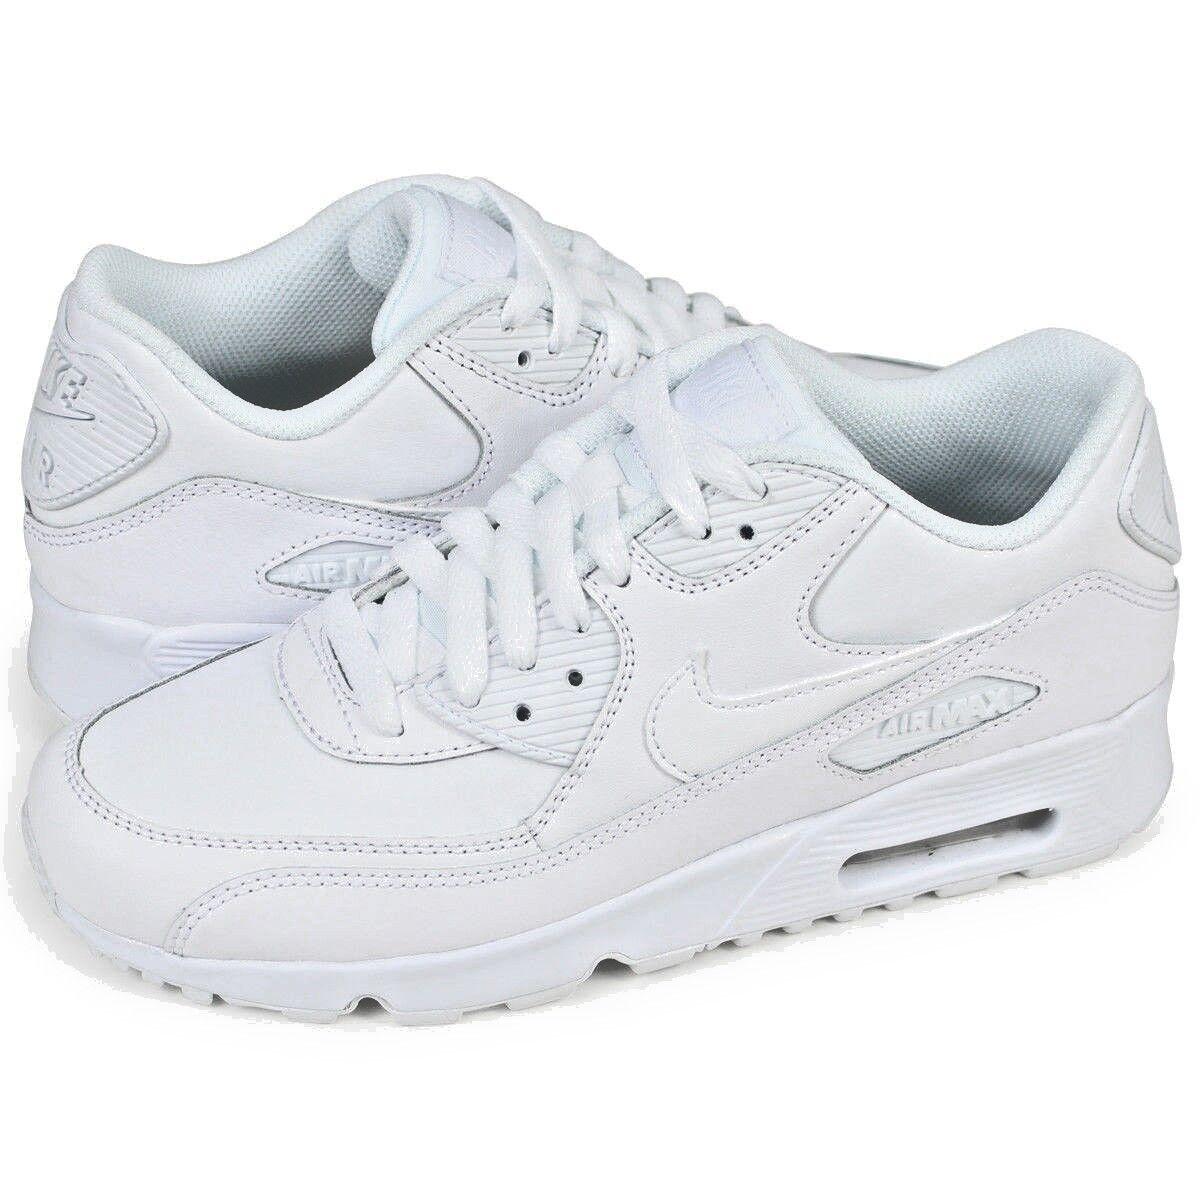 Scarpe Ragazzi Nike Air Max 90 Ltr (GS) 833412 100 Bianco scarpe da ginnastica Pelle Nuovo